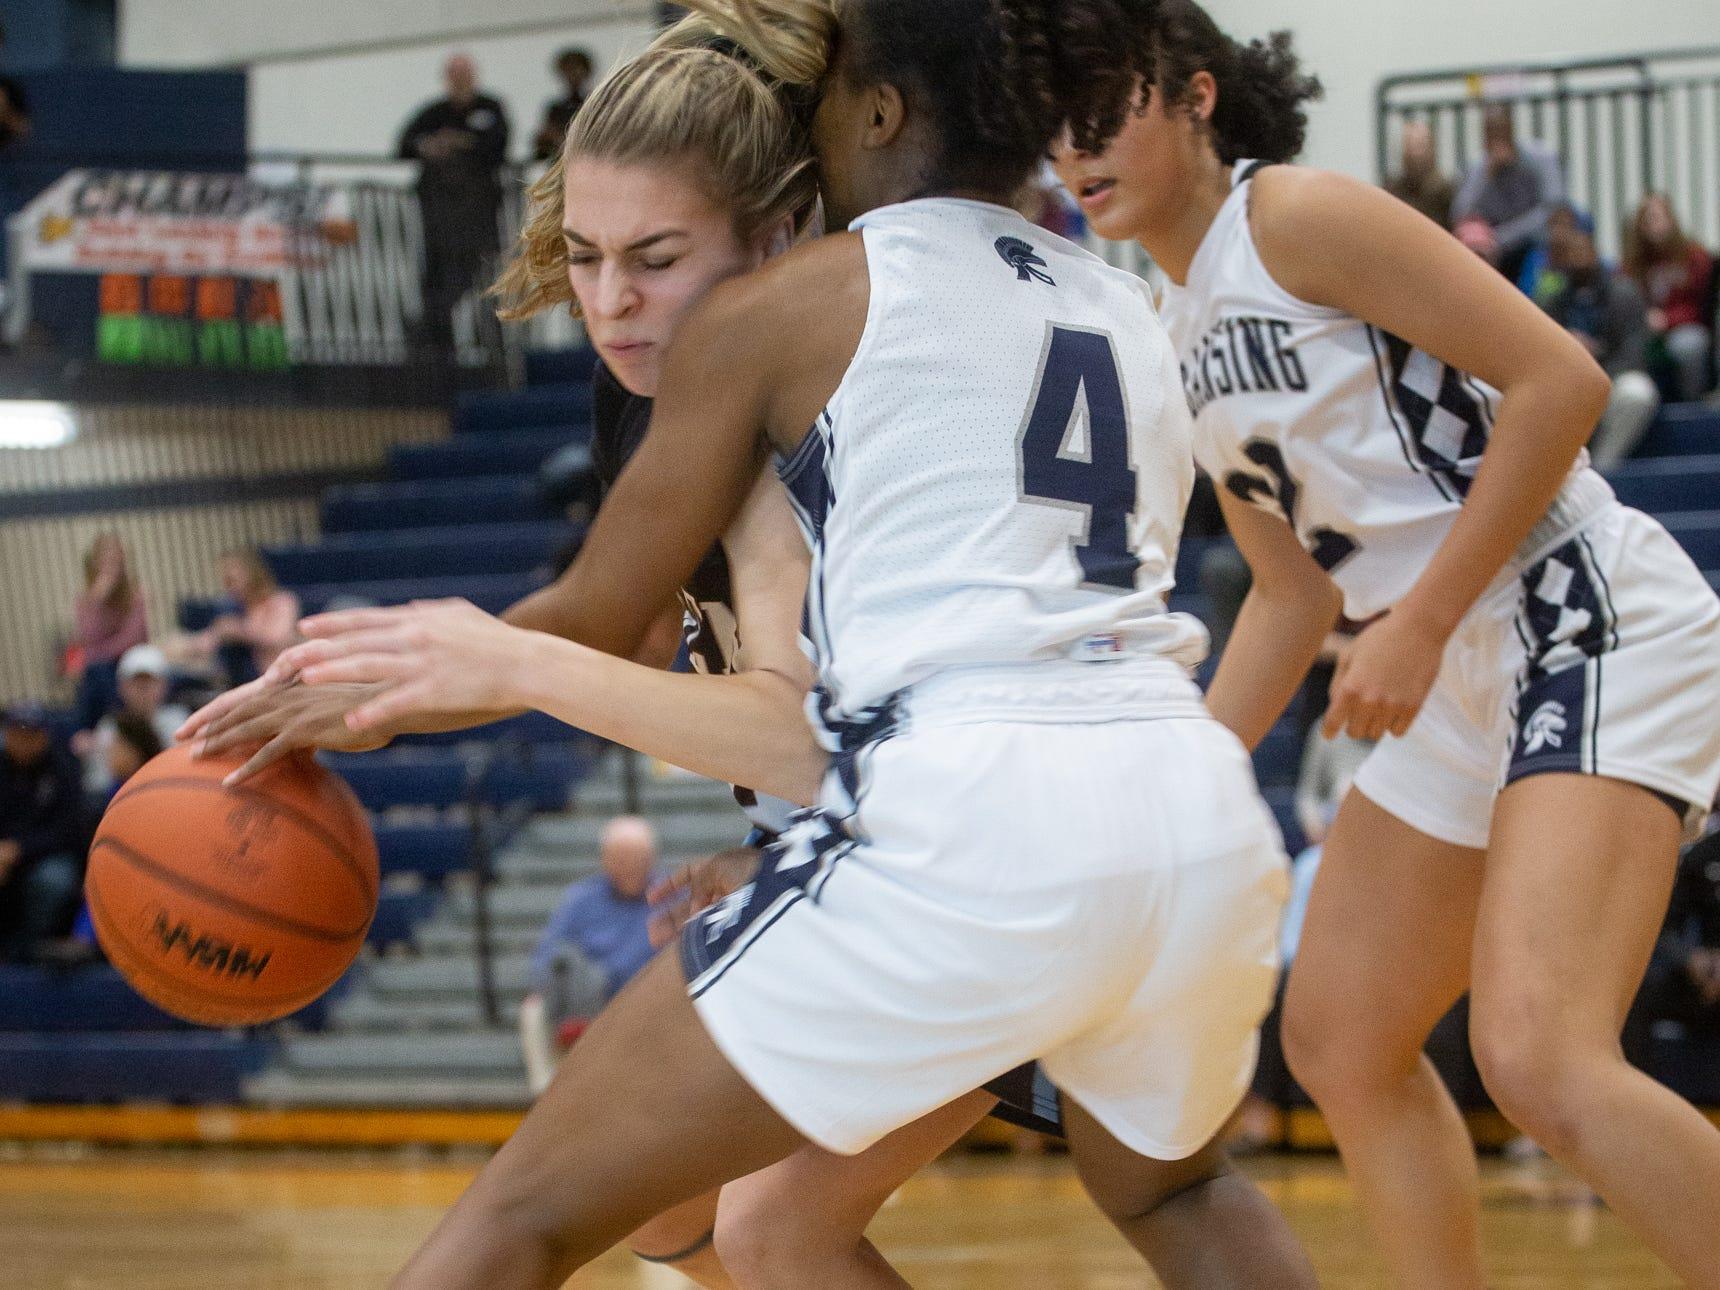 East Lanisng Junior, Sanaya Gregory tries to steal the ball from Okemos Sophomore, Lexie Sermak, Tuesday, Jan. 8, 2019 at East Lansing High School.